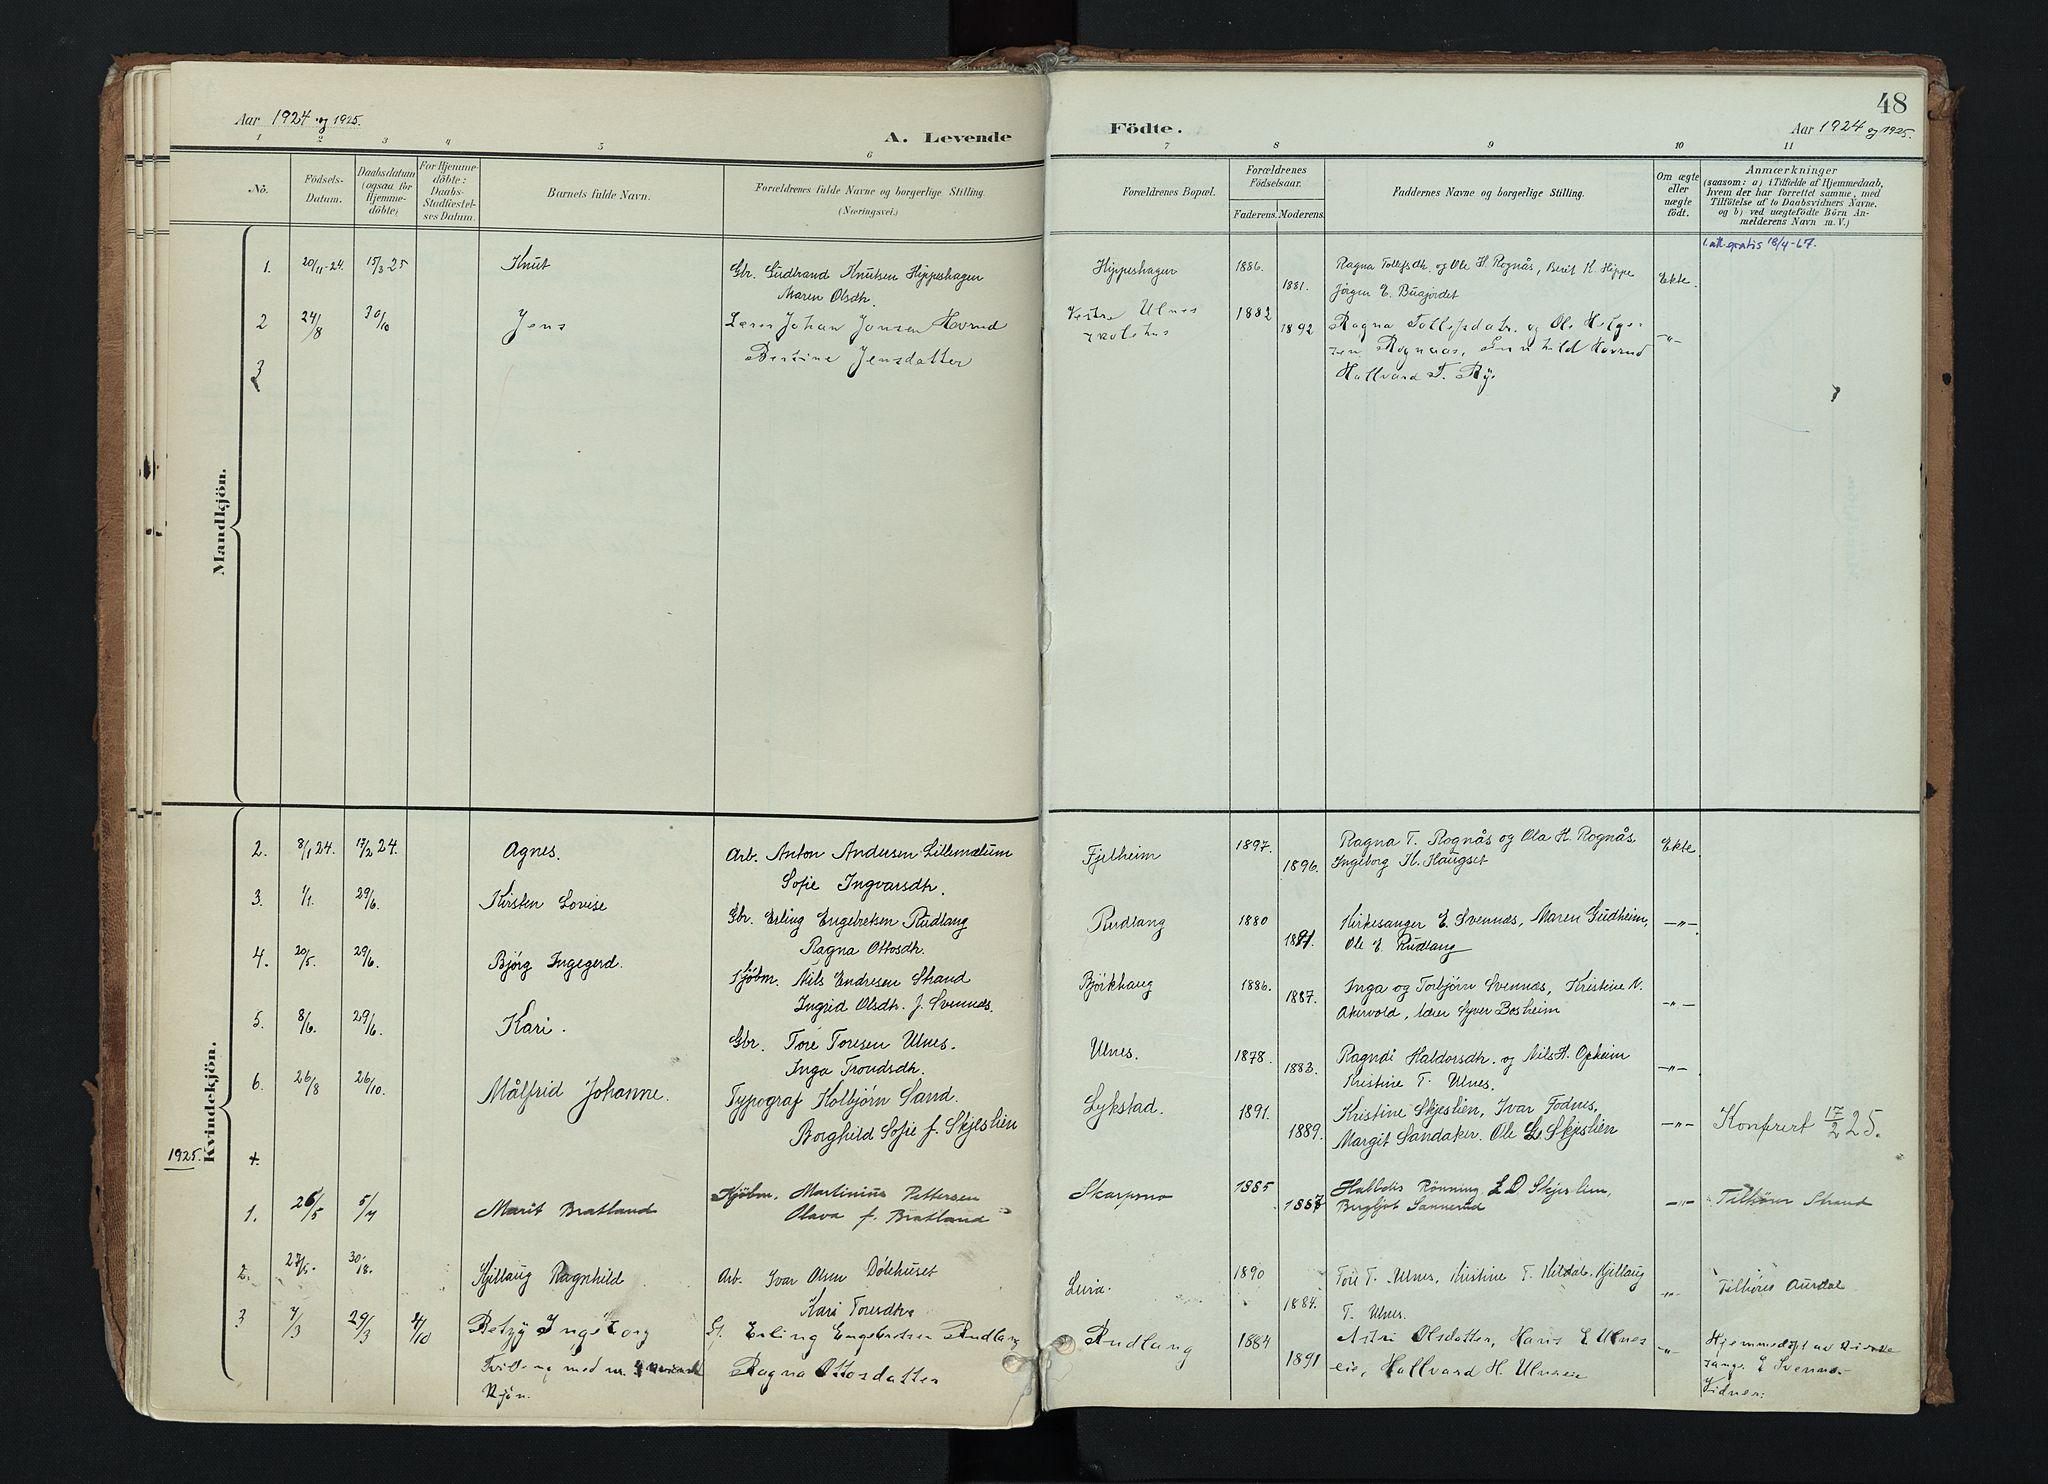 SAH, Nord-Aurdal prestekontor, Ministerialbok nr. 17, 1897-1926, s. 48